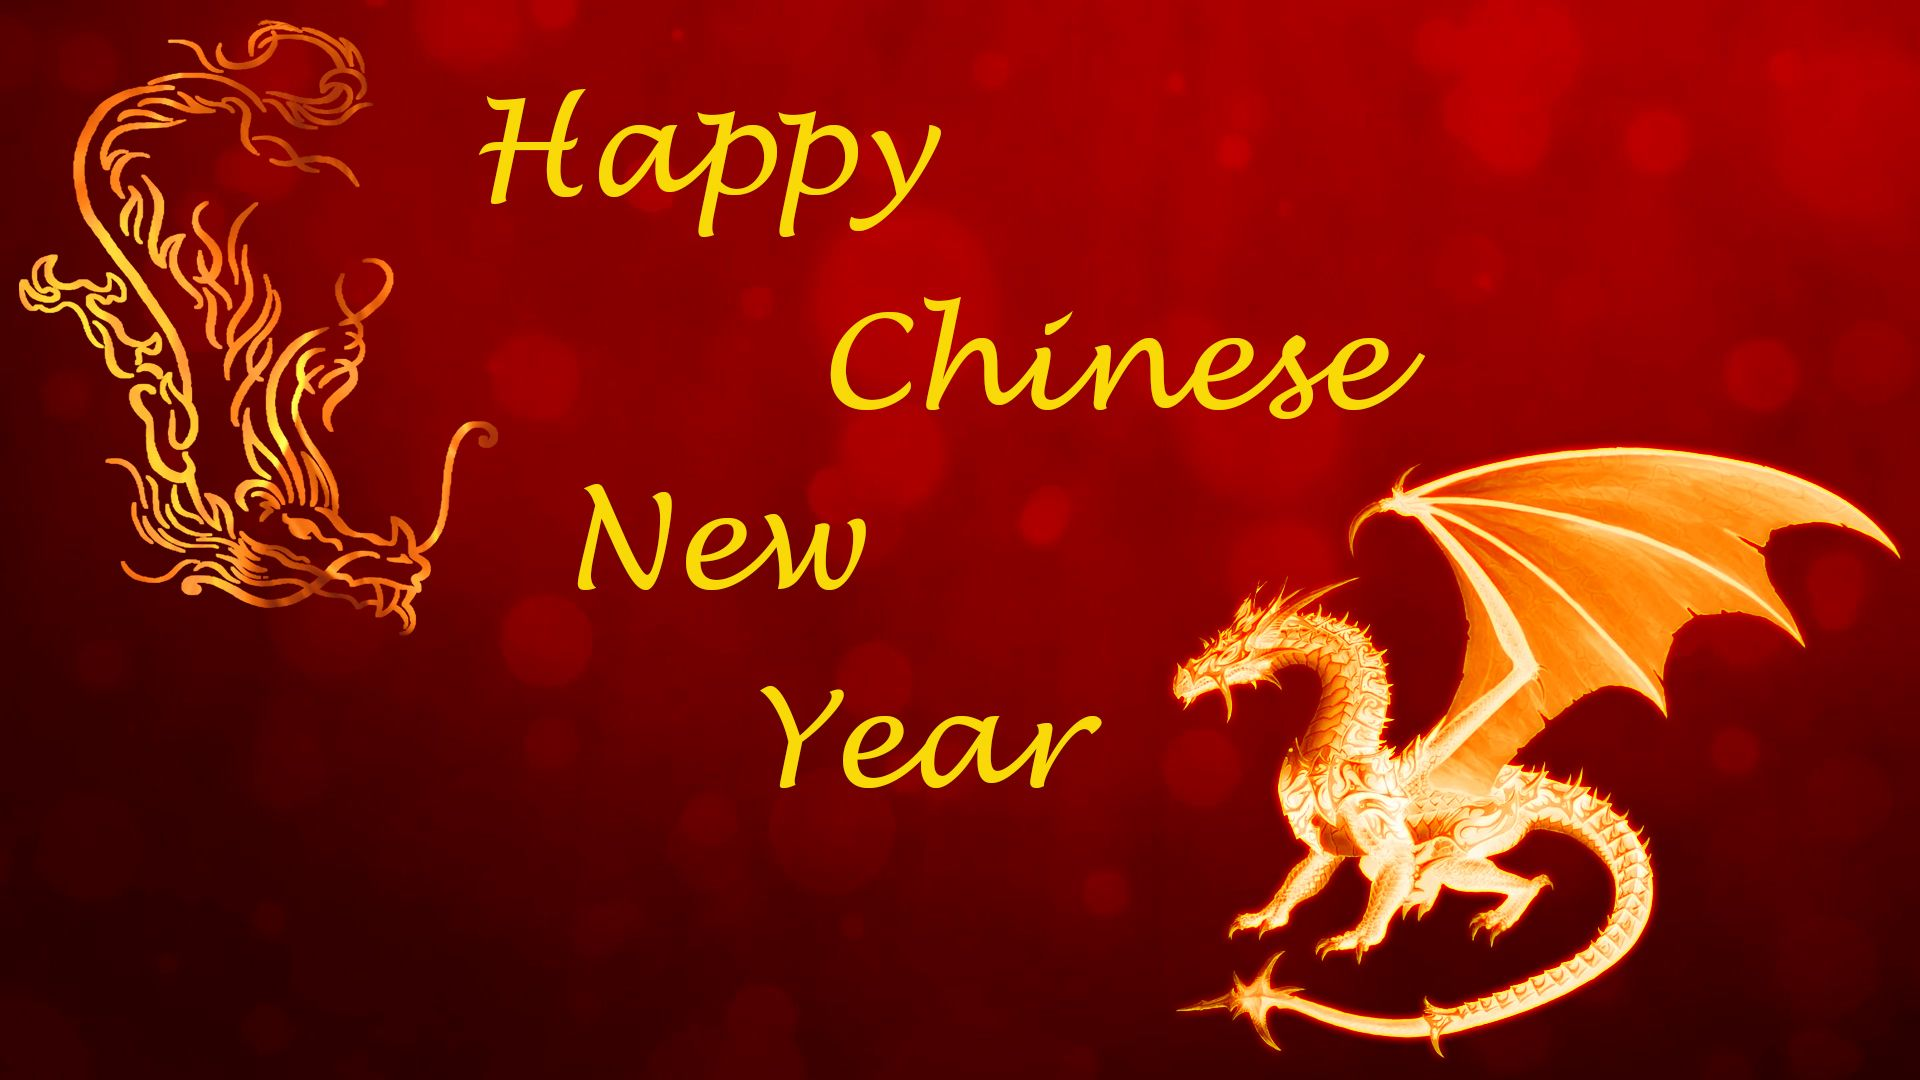 Chinese New Year 2019 Happy chinese new year, Chinese